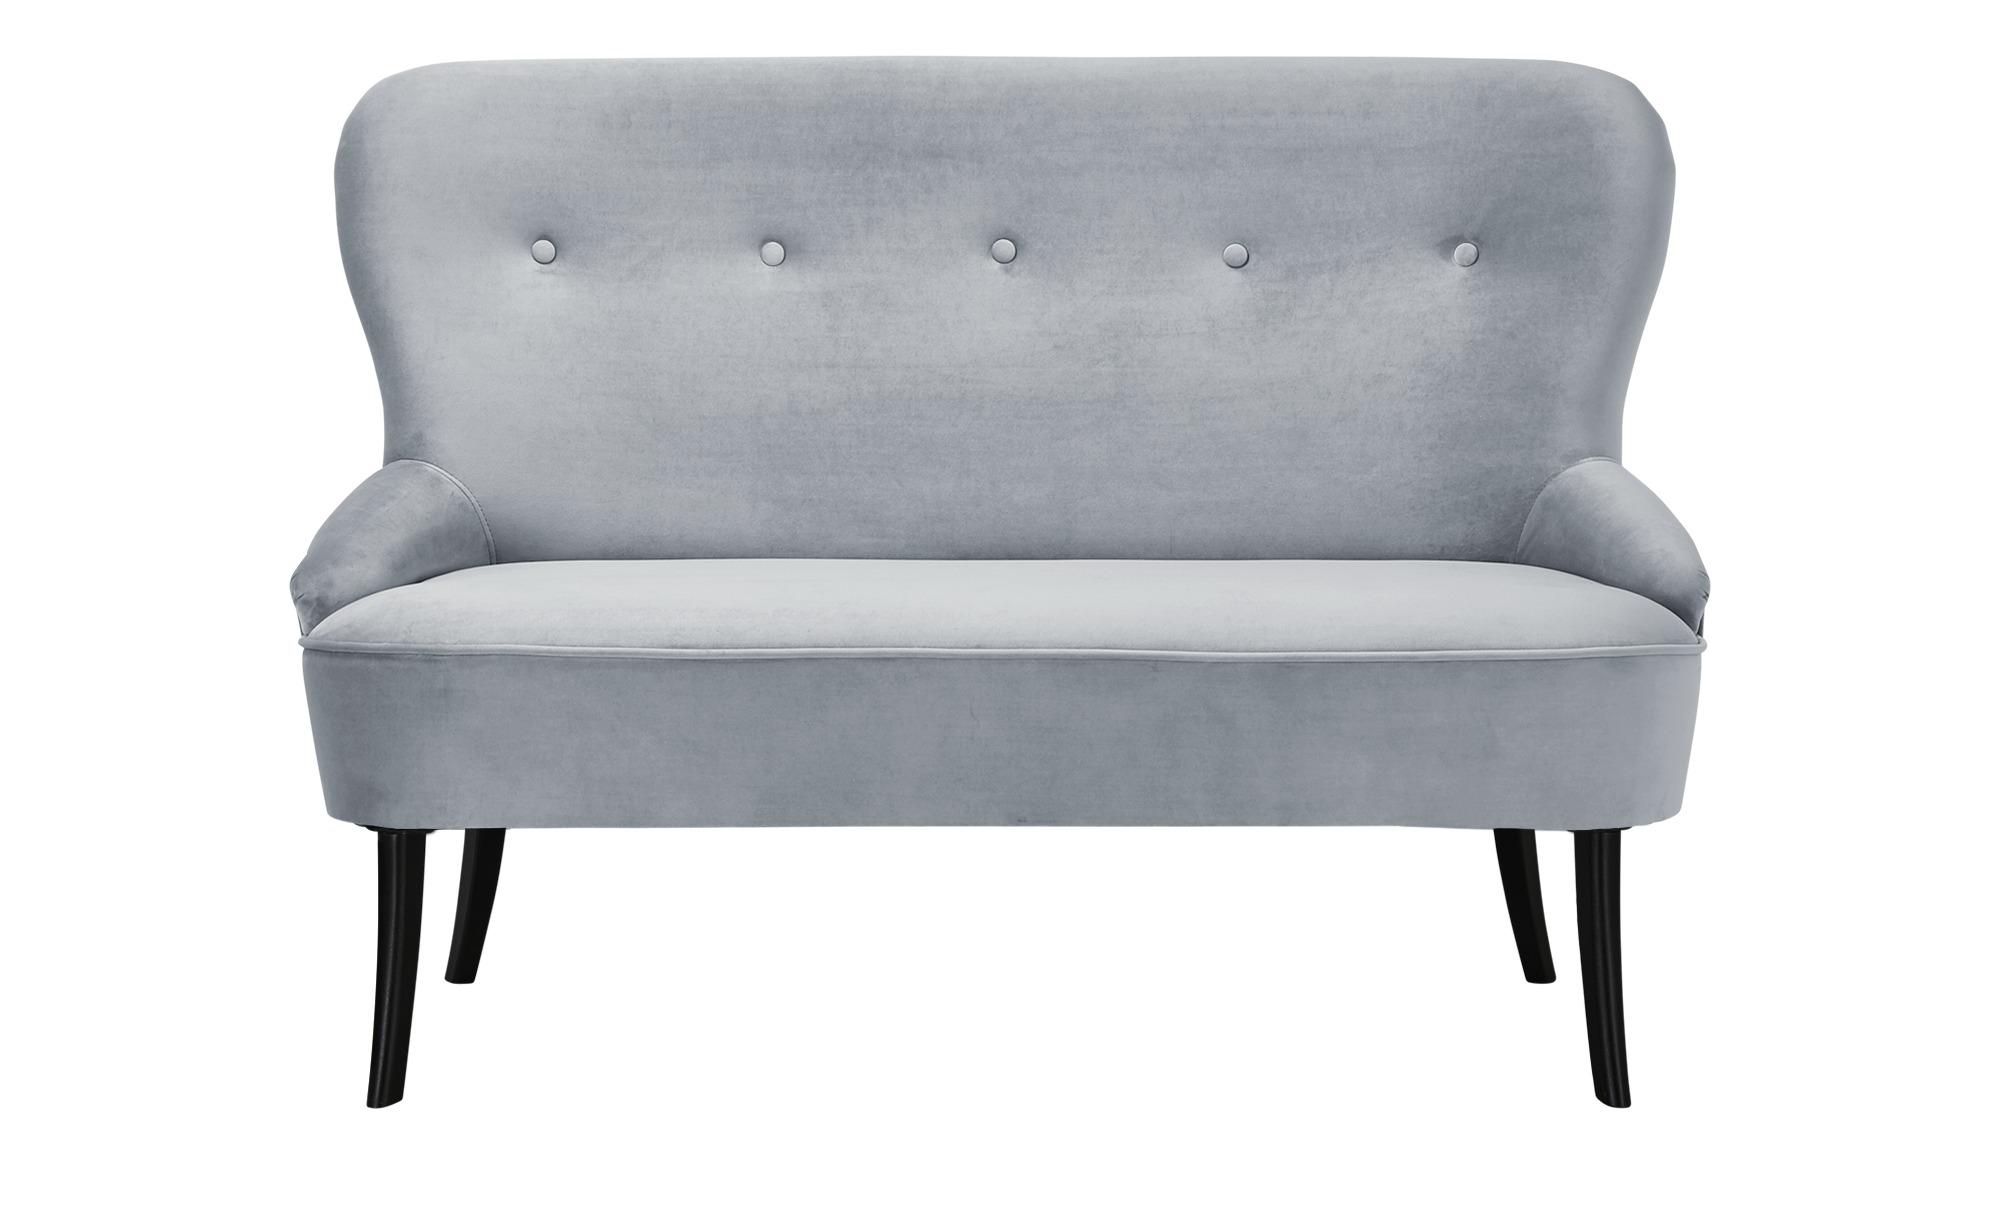 smart Sofa  Renia ¦ blau ¦ Maße (cm): B: 130 H: 89 T: 72 Polstermöbel > Sofas > 2-Sitzer - Höffner